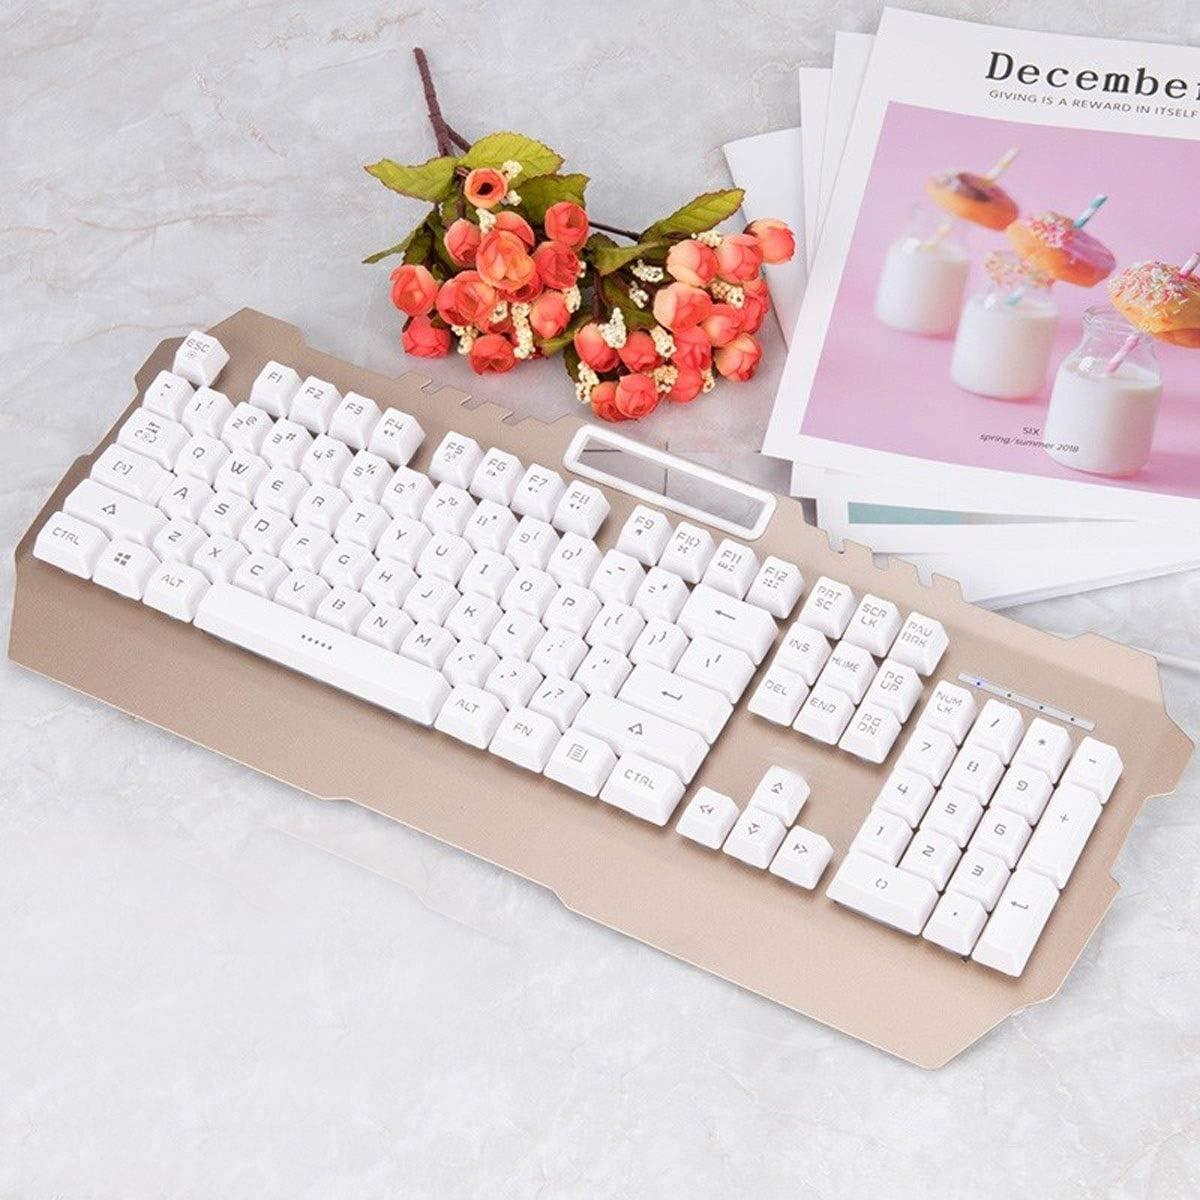 Mechanical Feel Game Desktop Laptop Keyboard Fashion White Yellow Light, 46.419.22.3cm Jingfeng Keyboard Color : Black-Yellow Cable Esport Ergonomic Design